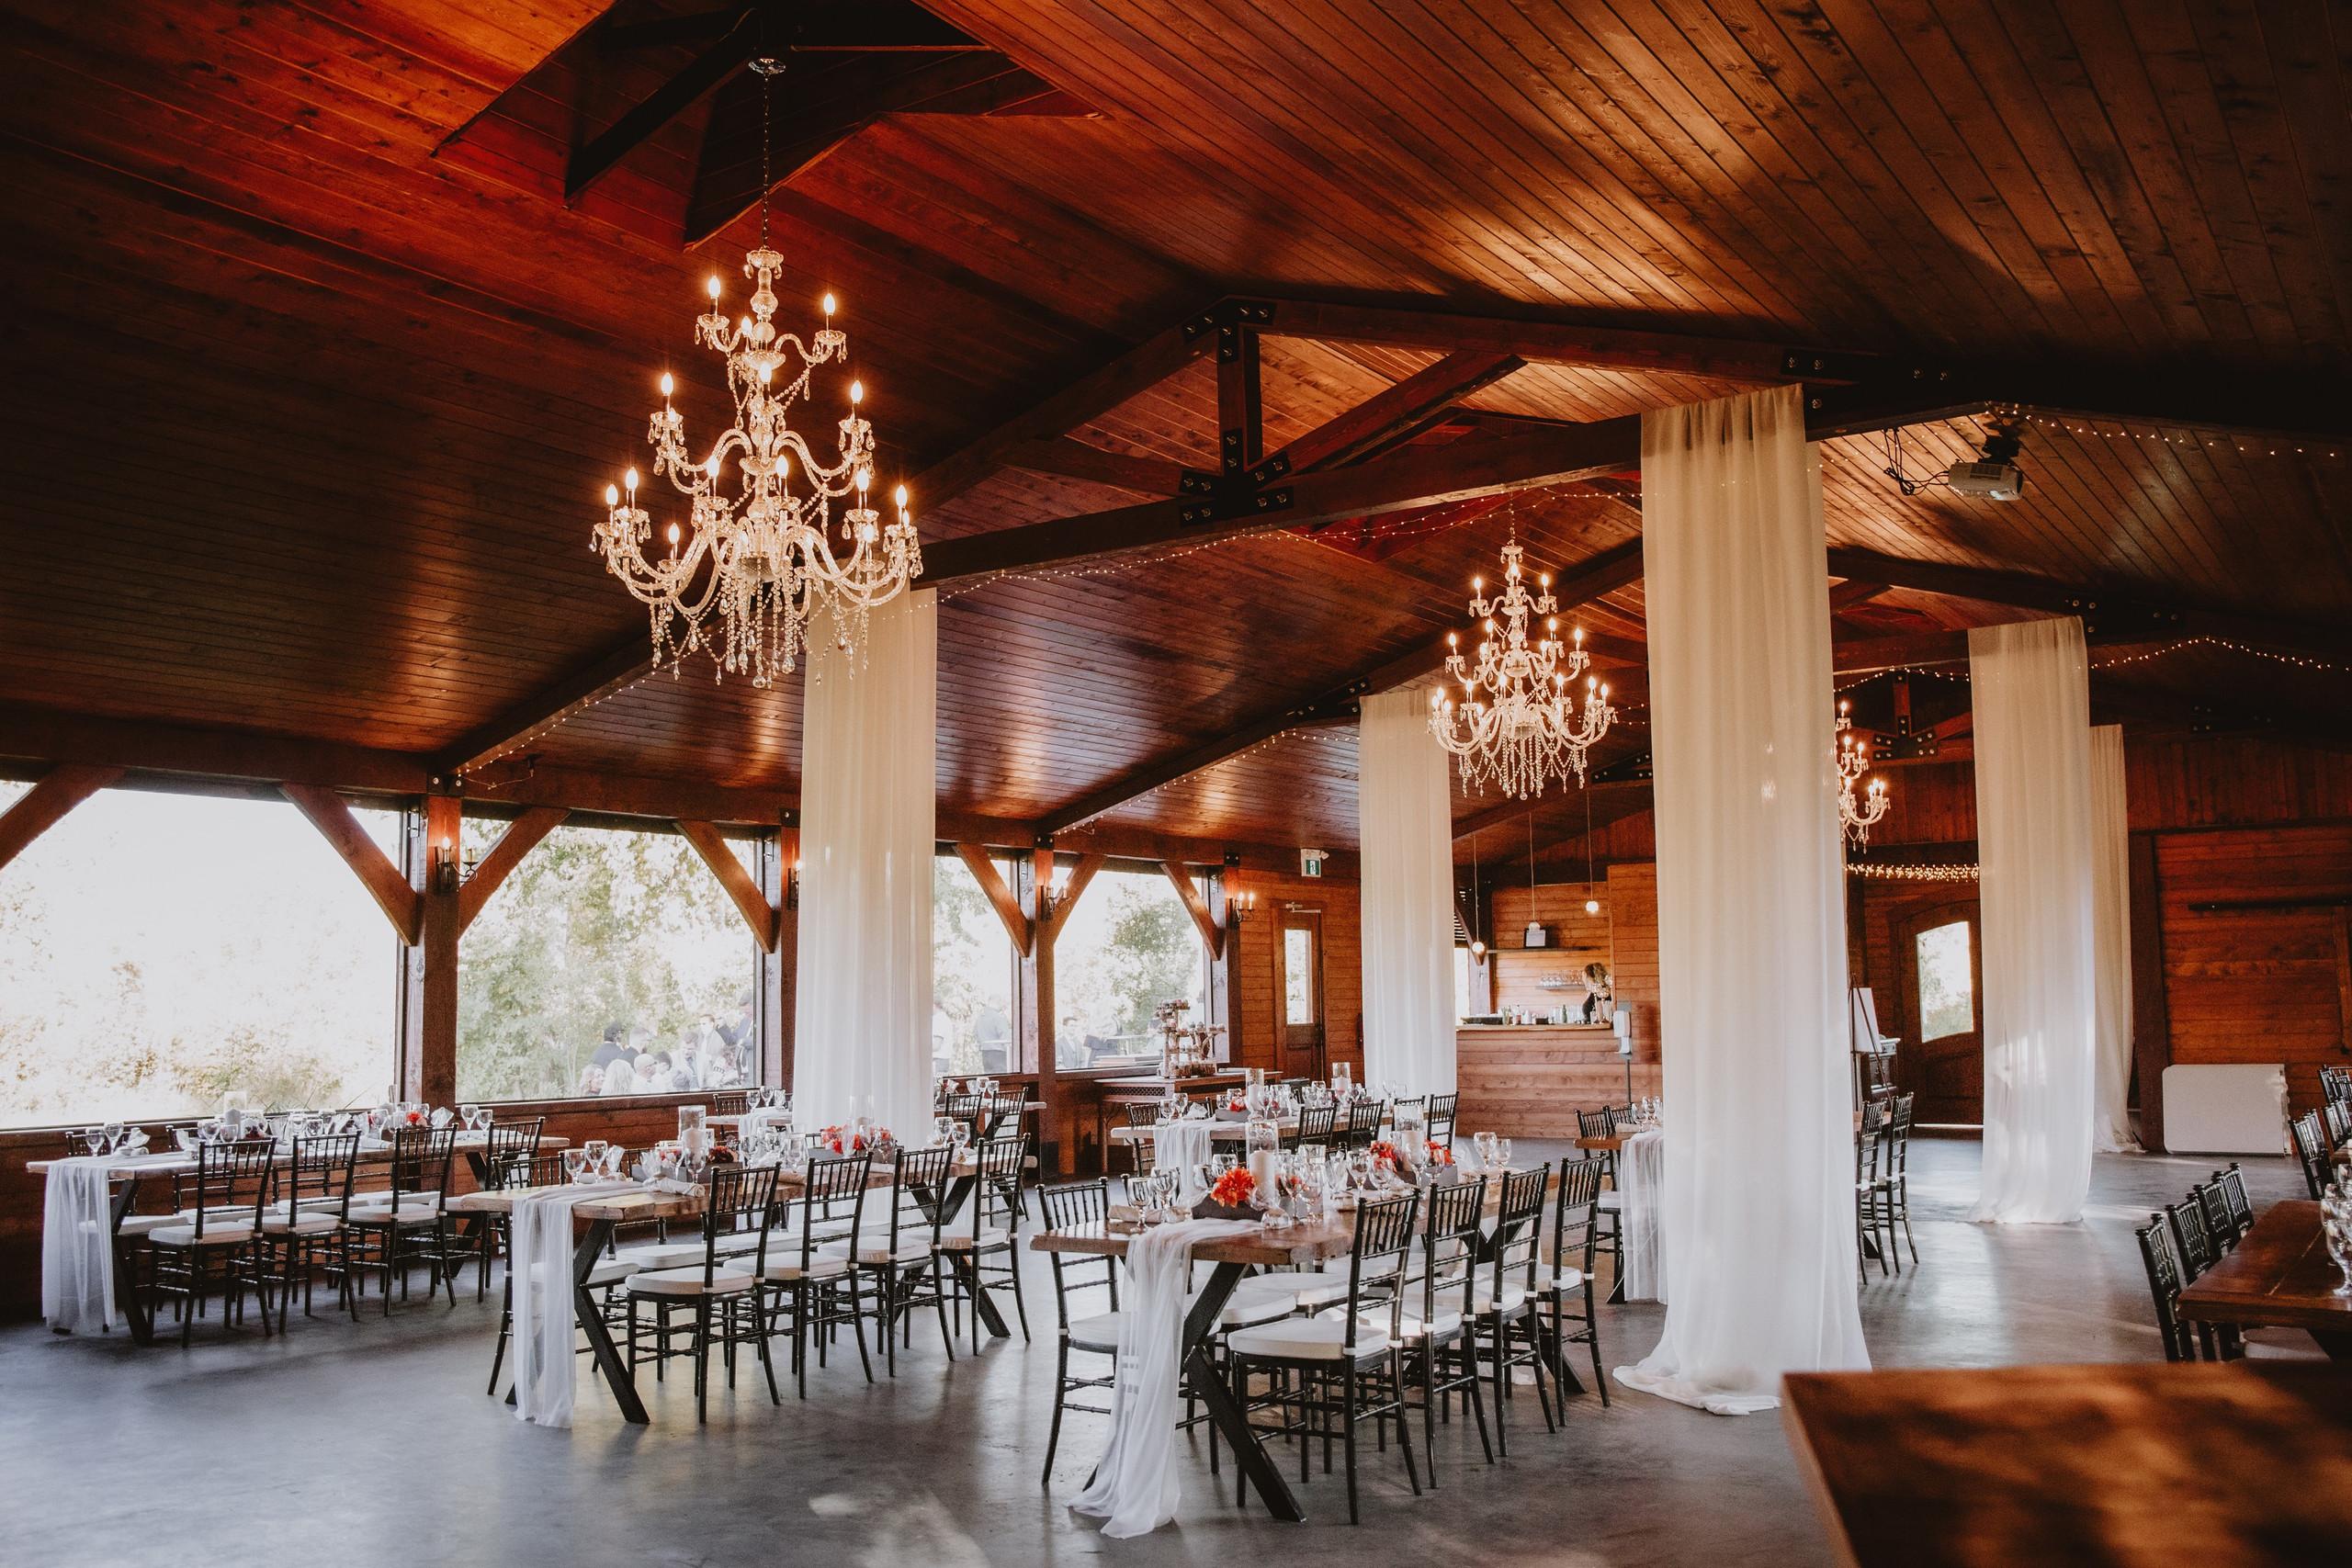 Stunning Fall Wedding Venue in Elma, Manitoba - Rivers Edge Resort.